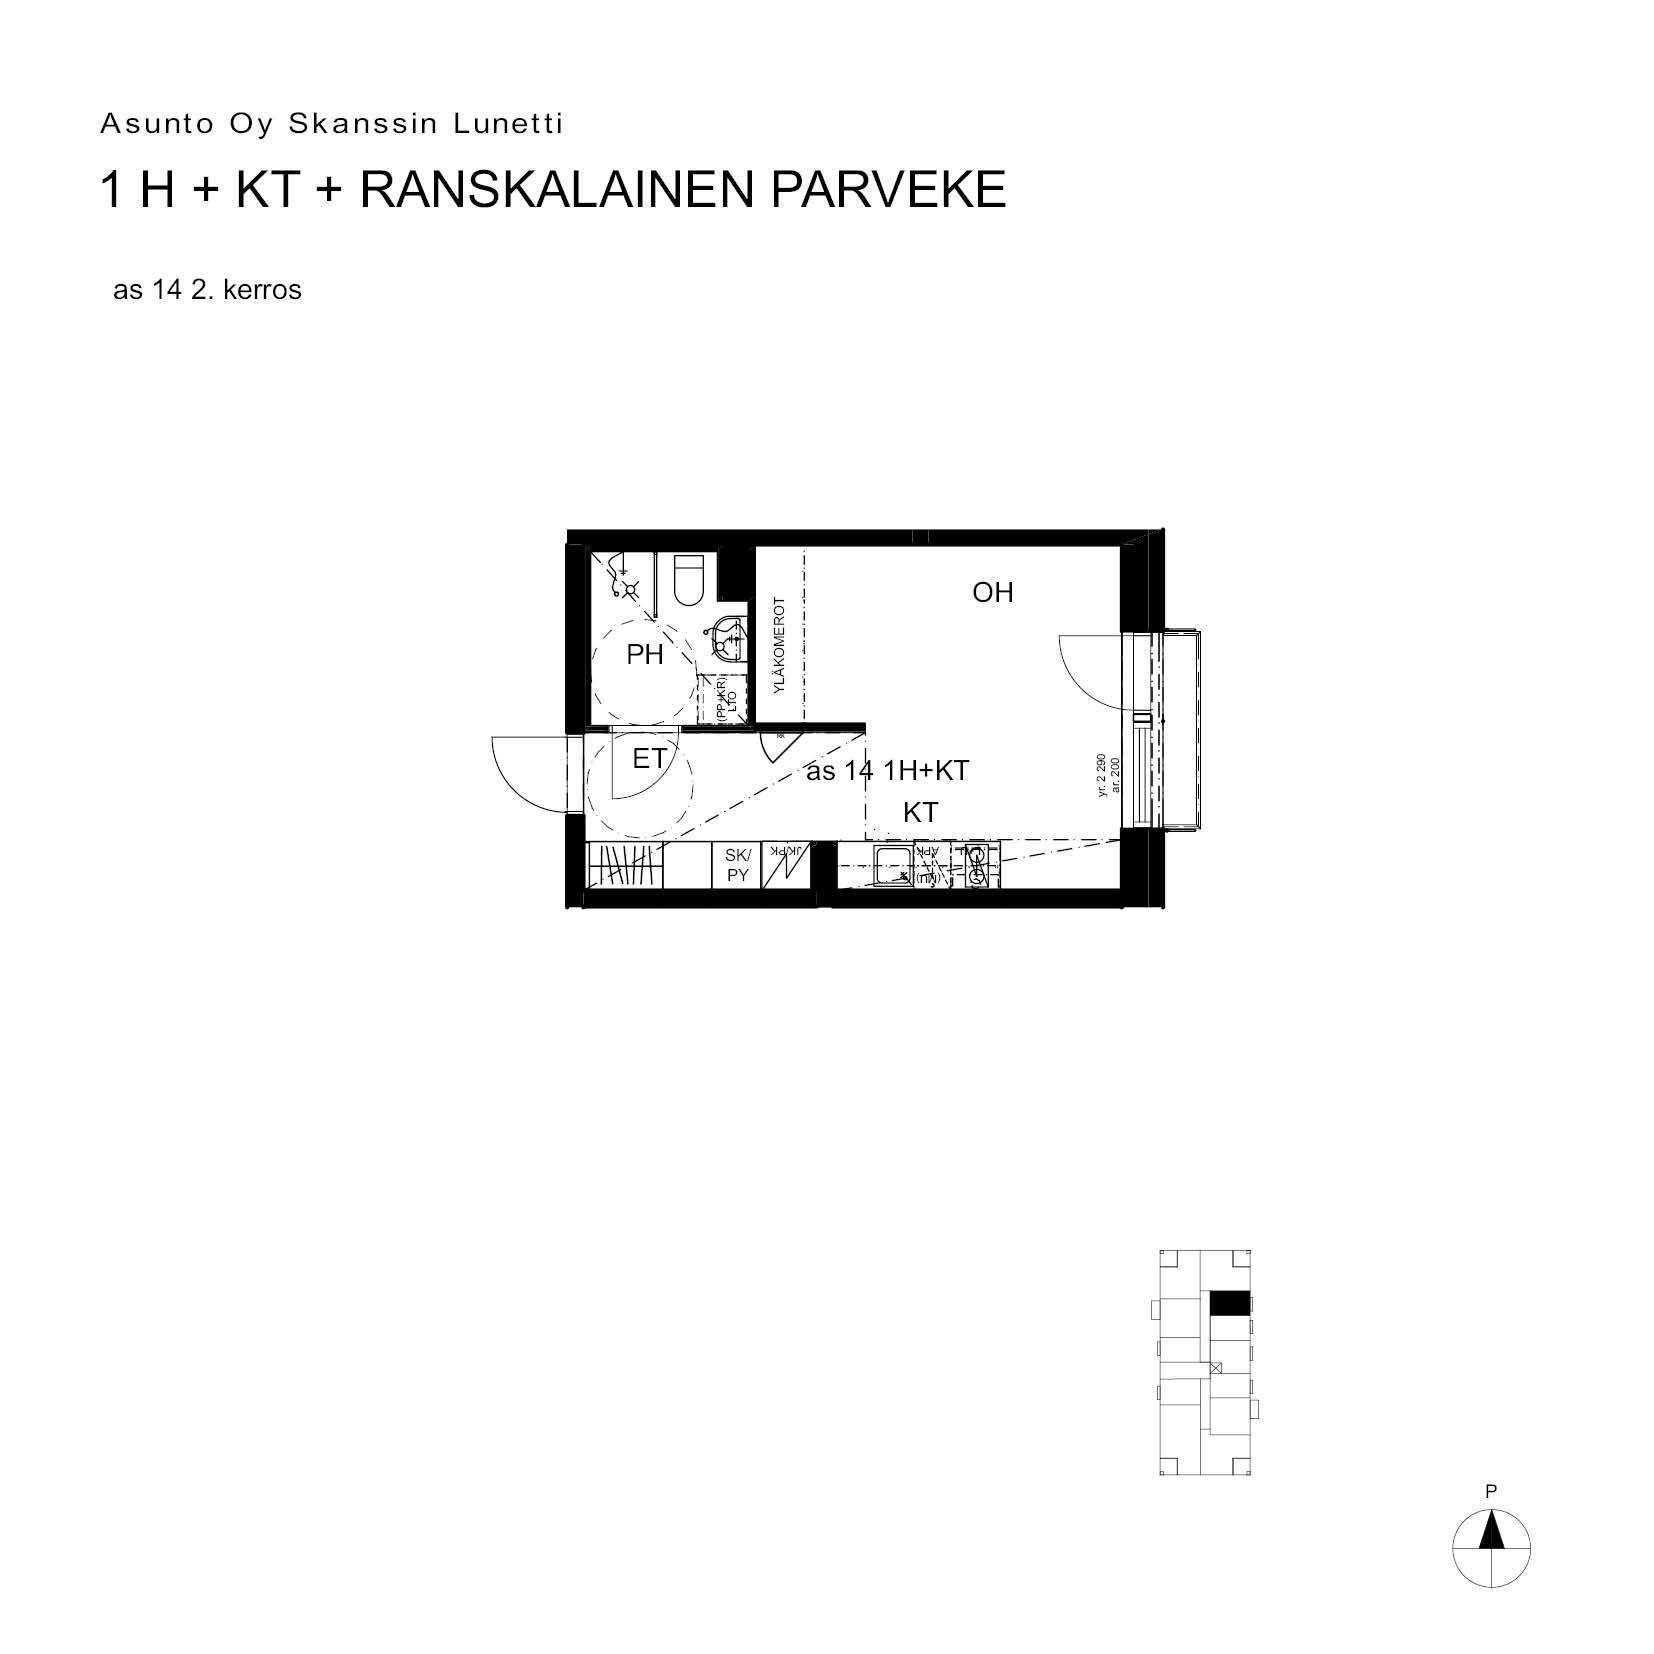 Asunto Oy Turun Skanssin Lunetti - Skanssinkatu 36, 20730, Turku - 1H+KT+ransk.p. / 27.5m2